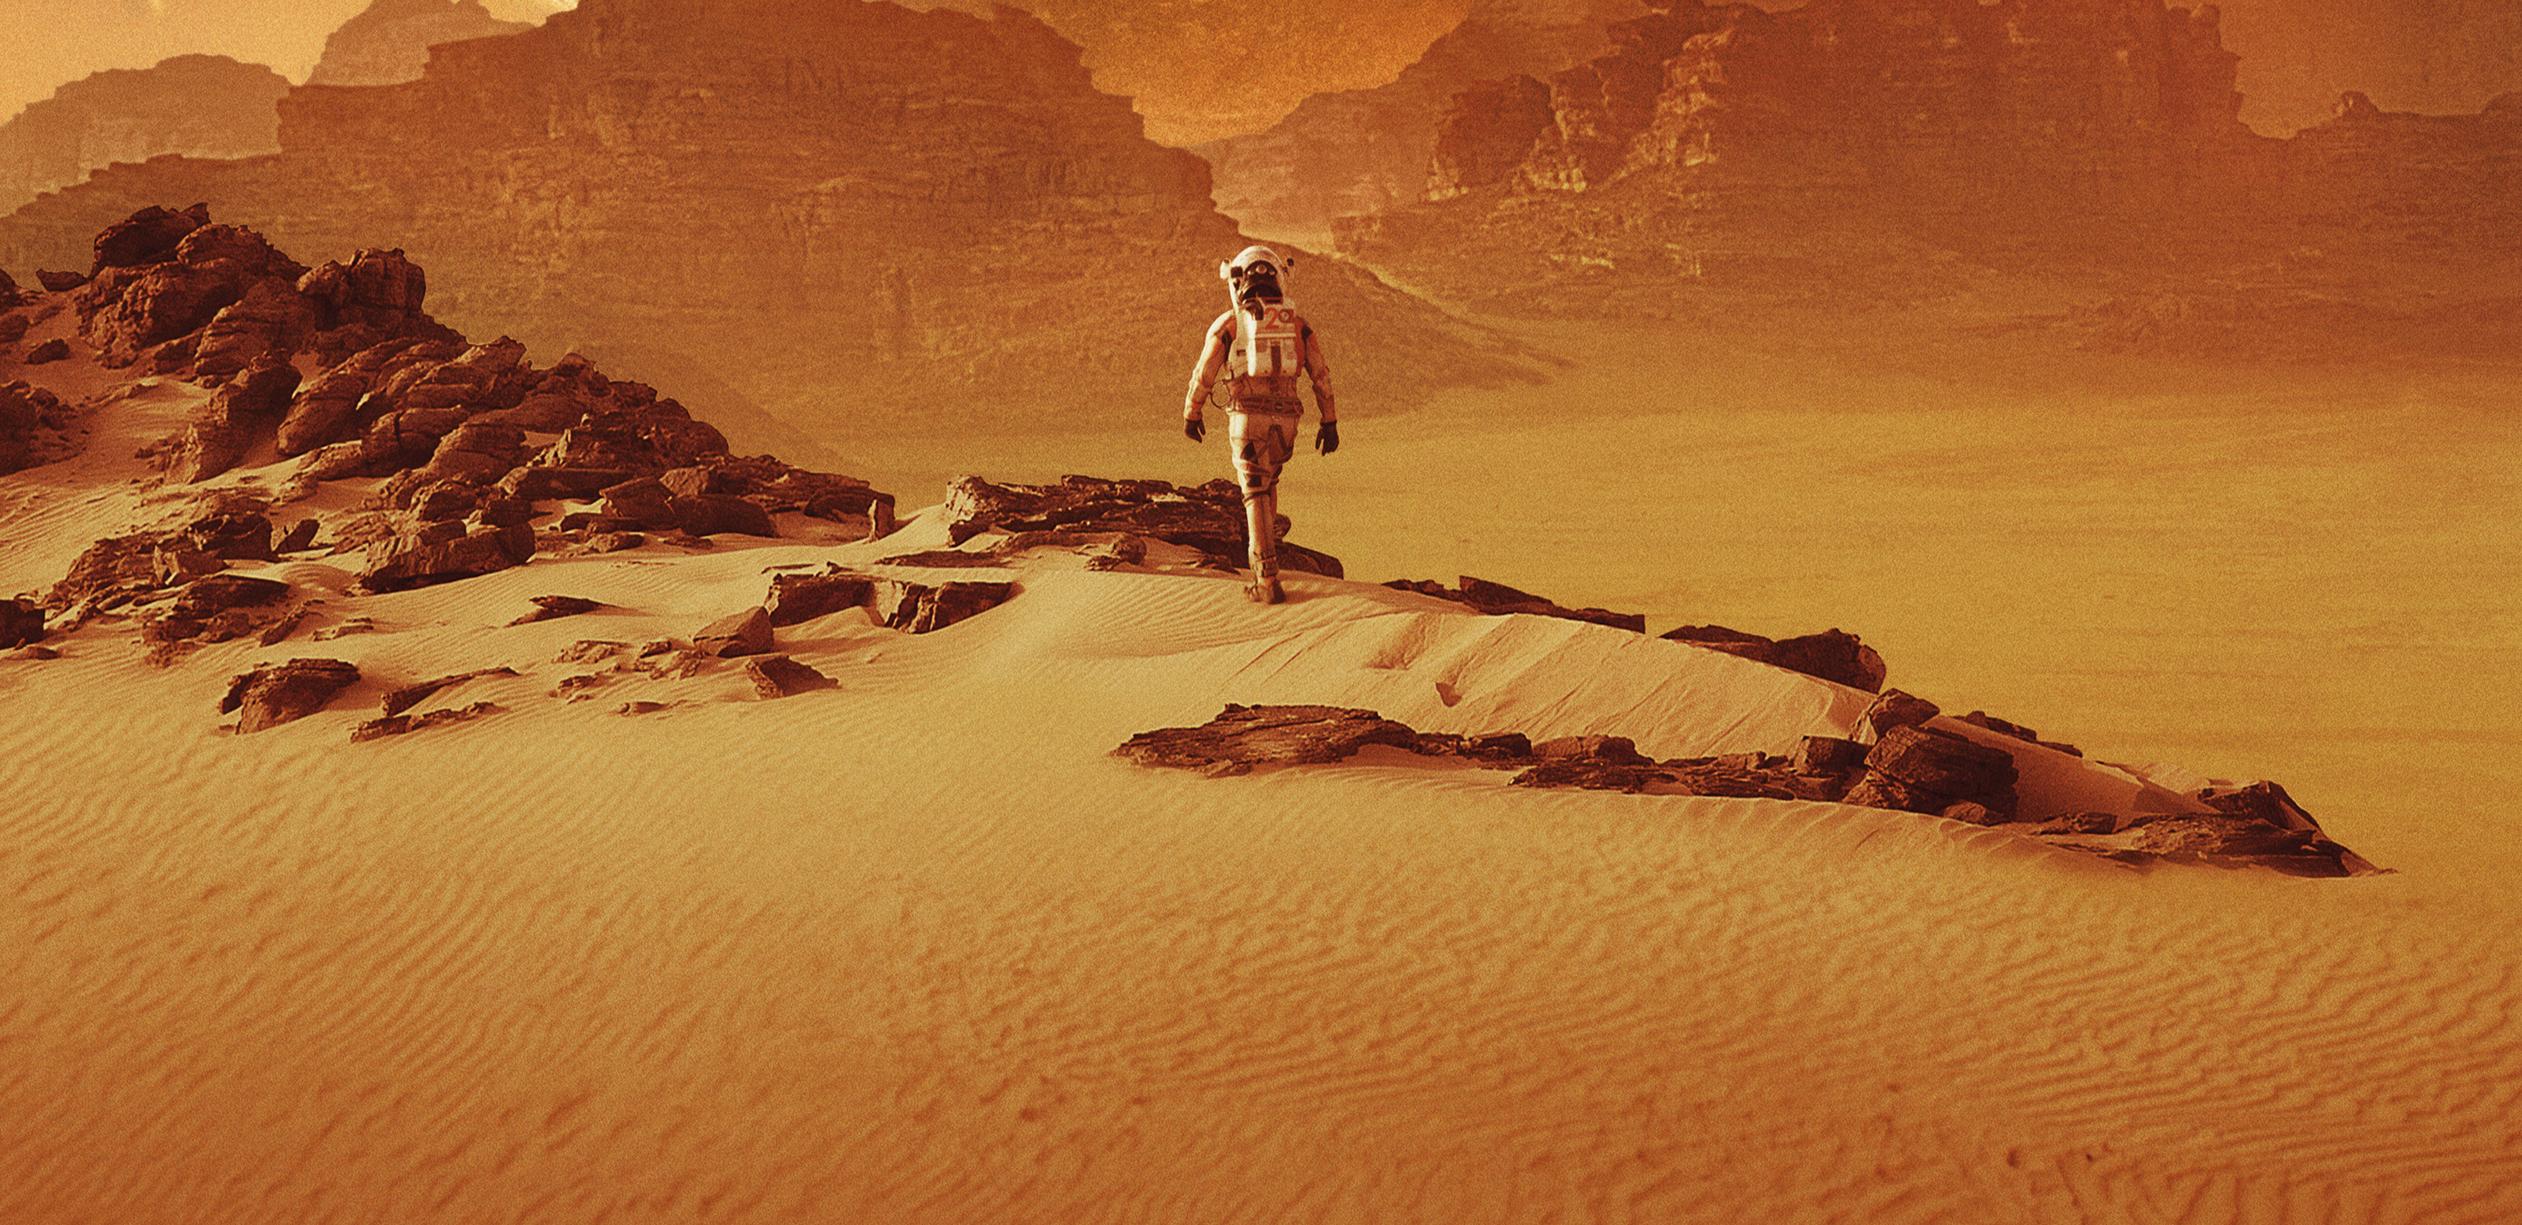 NASA 人人必读的《火星救援》是如何诞生的?